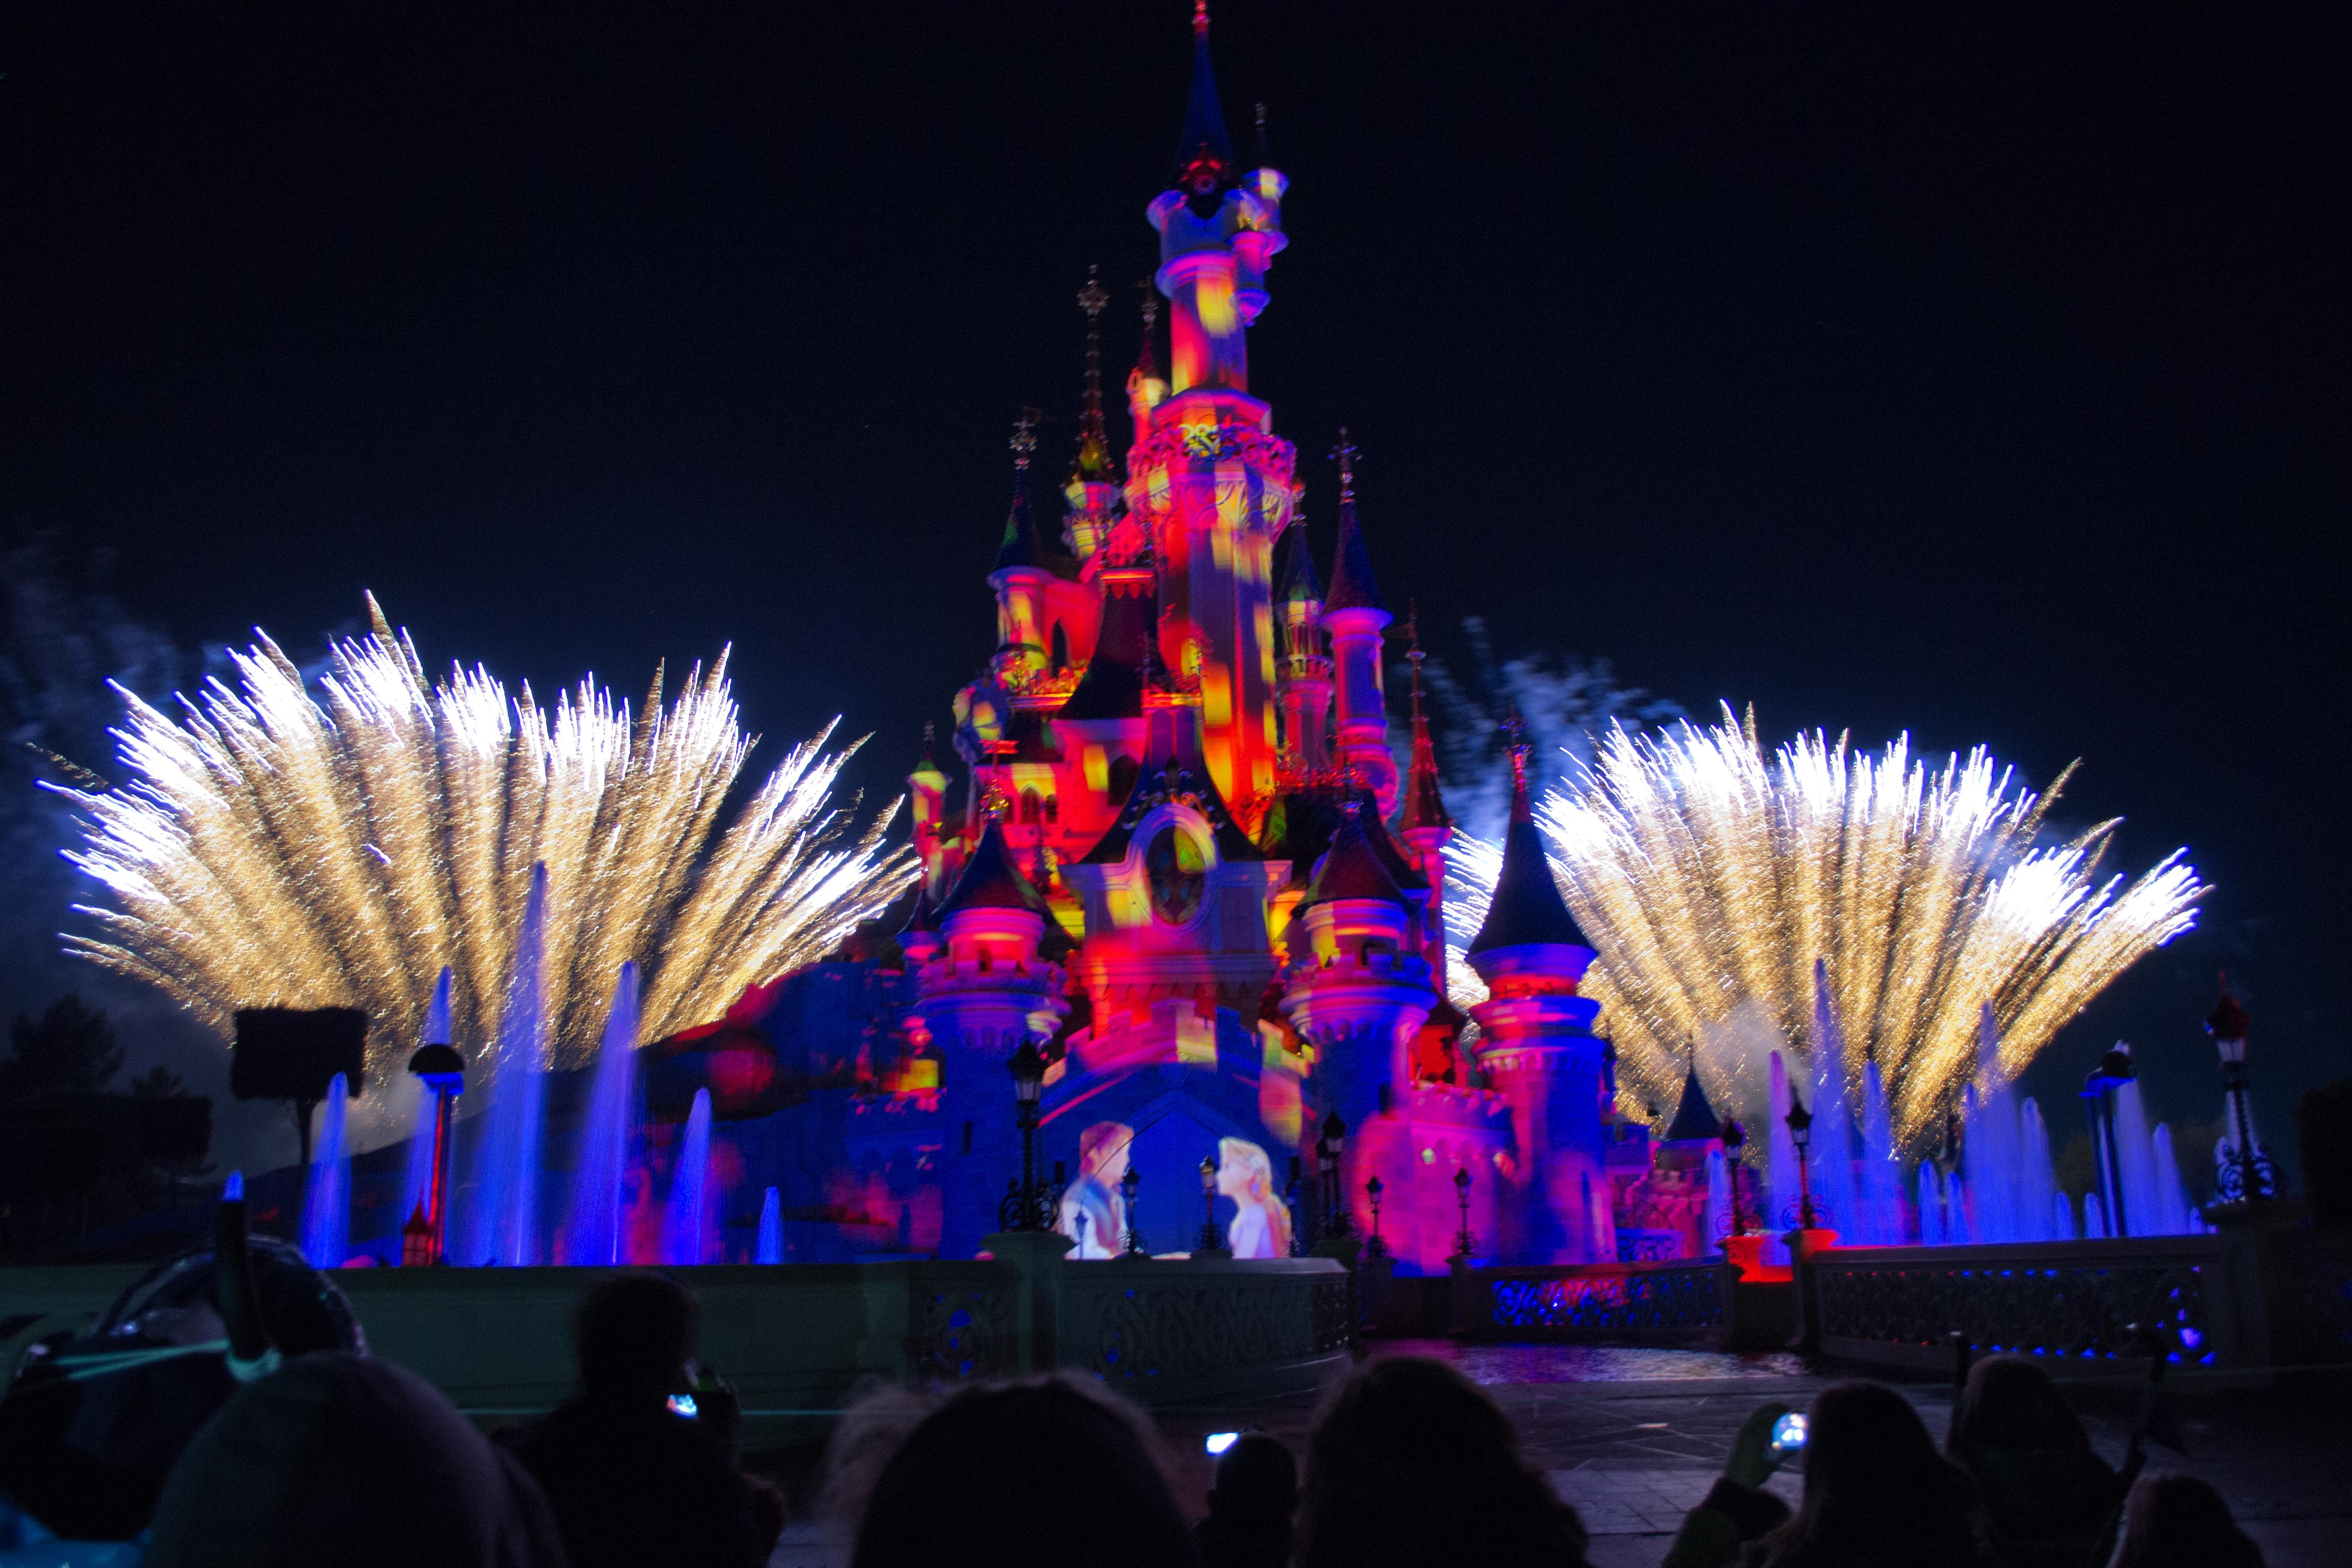 Disneyland Fireworks Wallpaper wallpaper wallpaper hd background 4608x3072